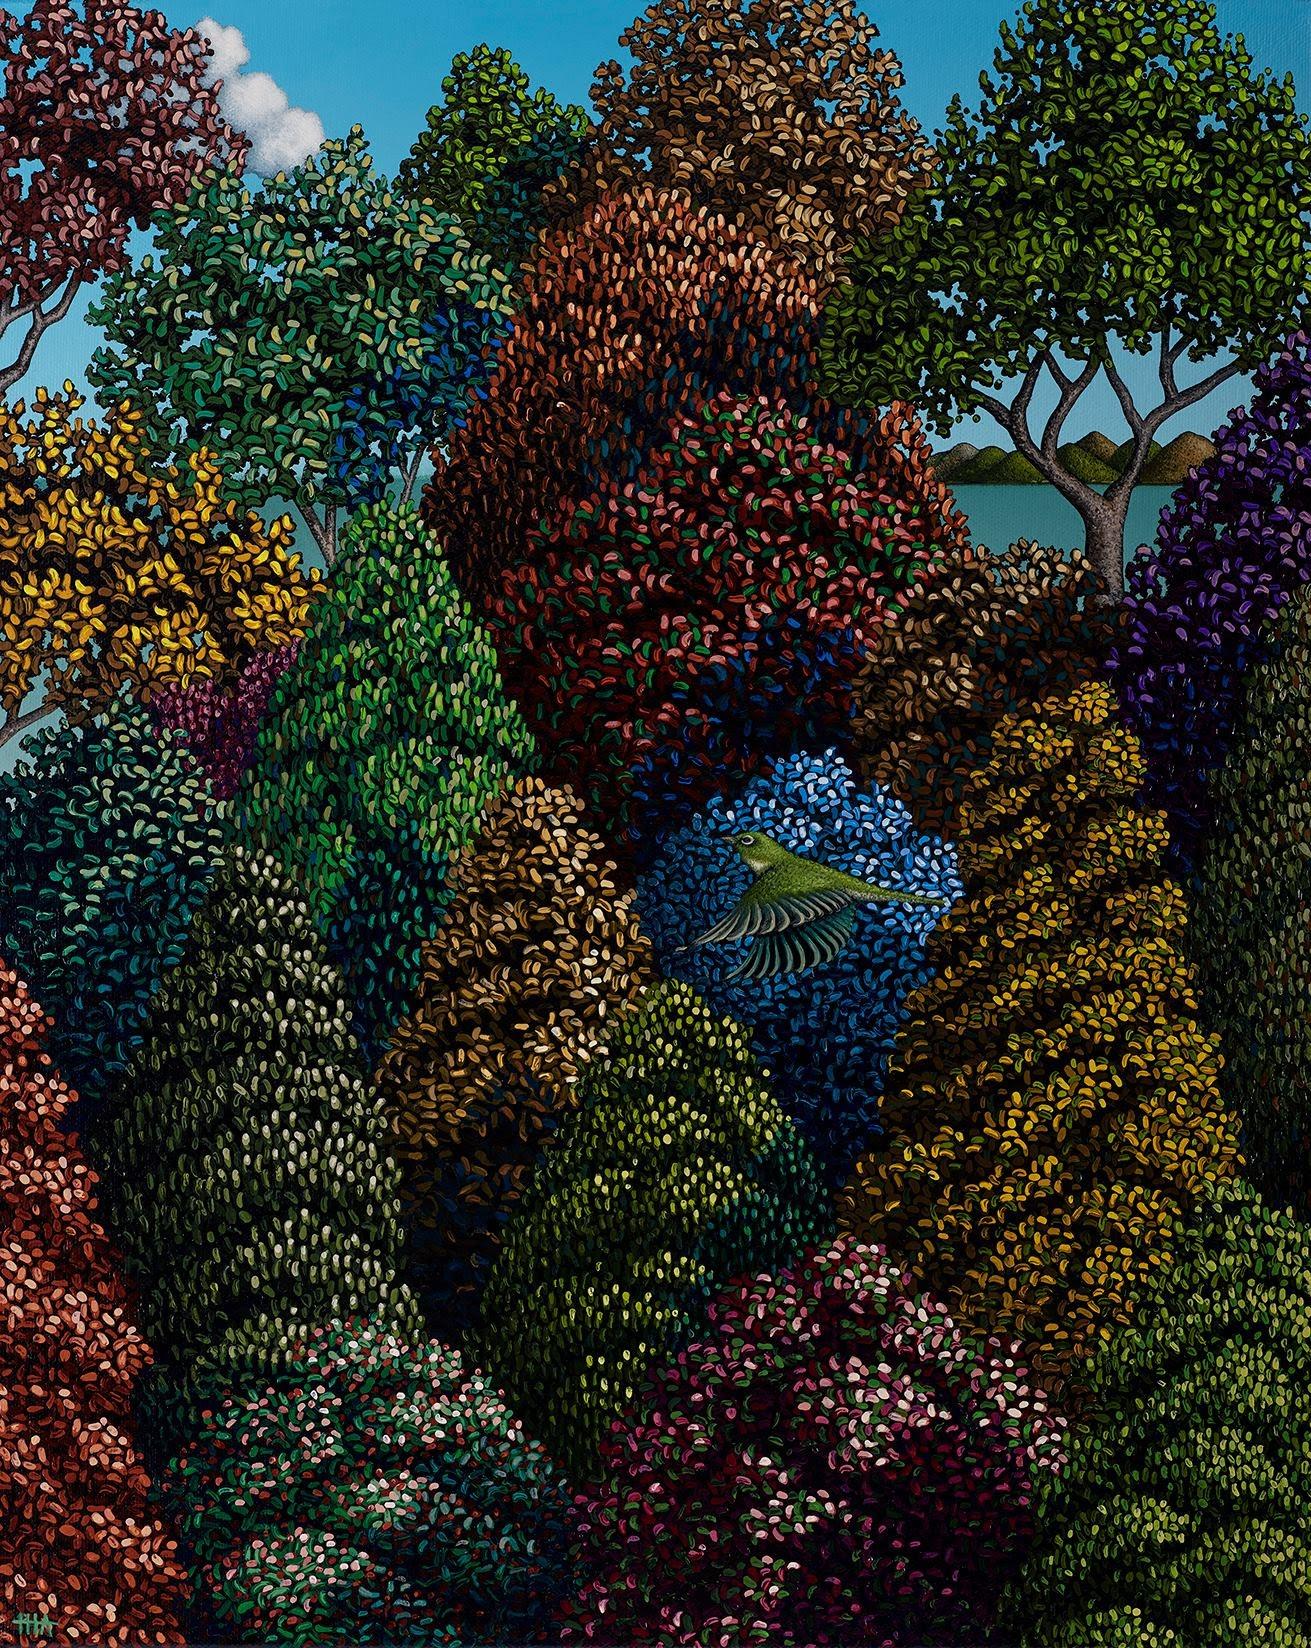 Hamish Allan Punchdrunk and the pleasure garden